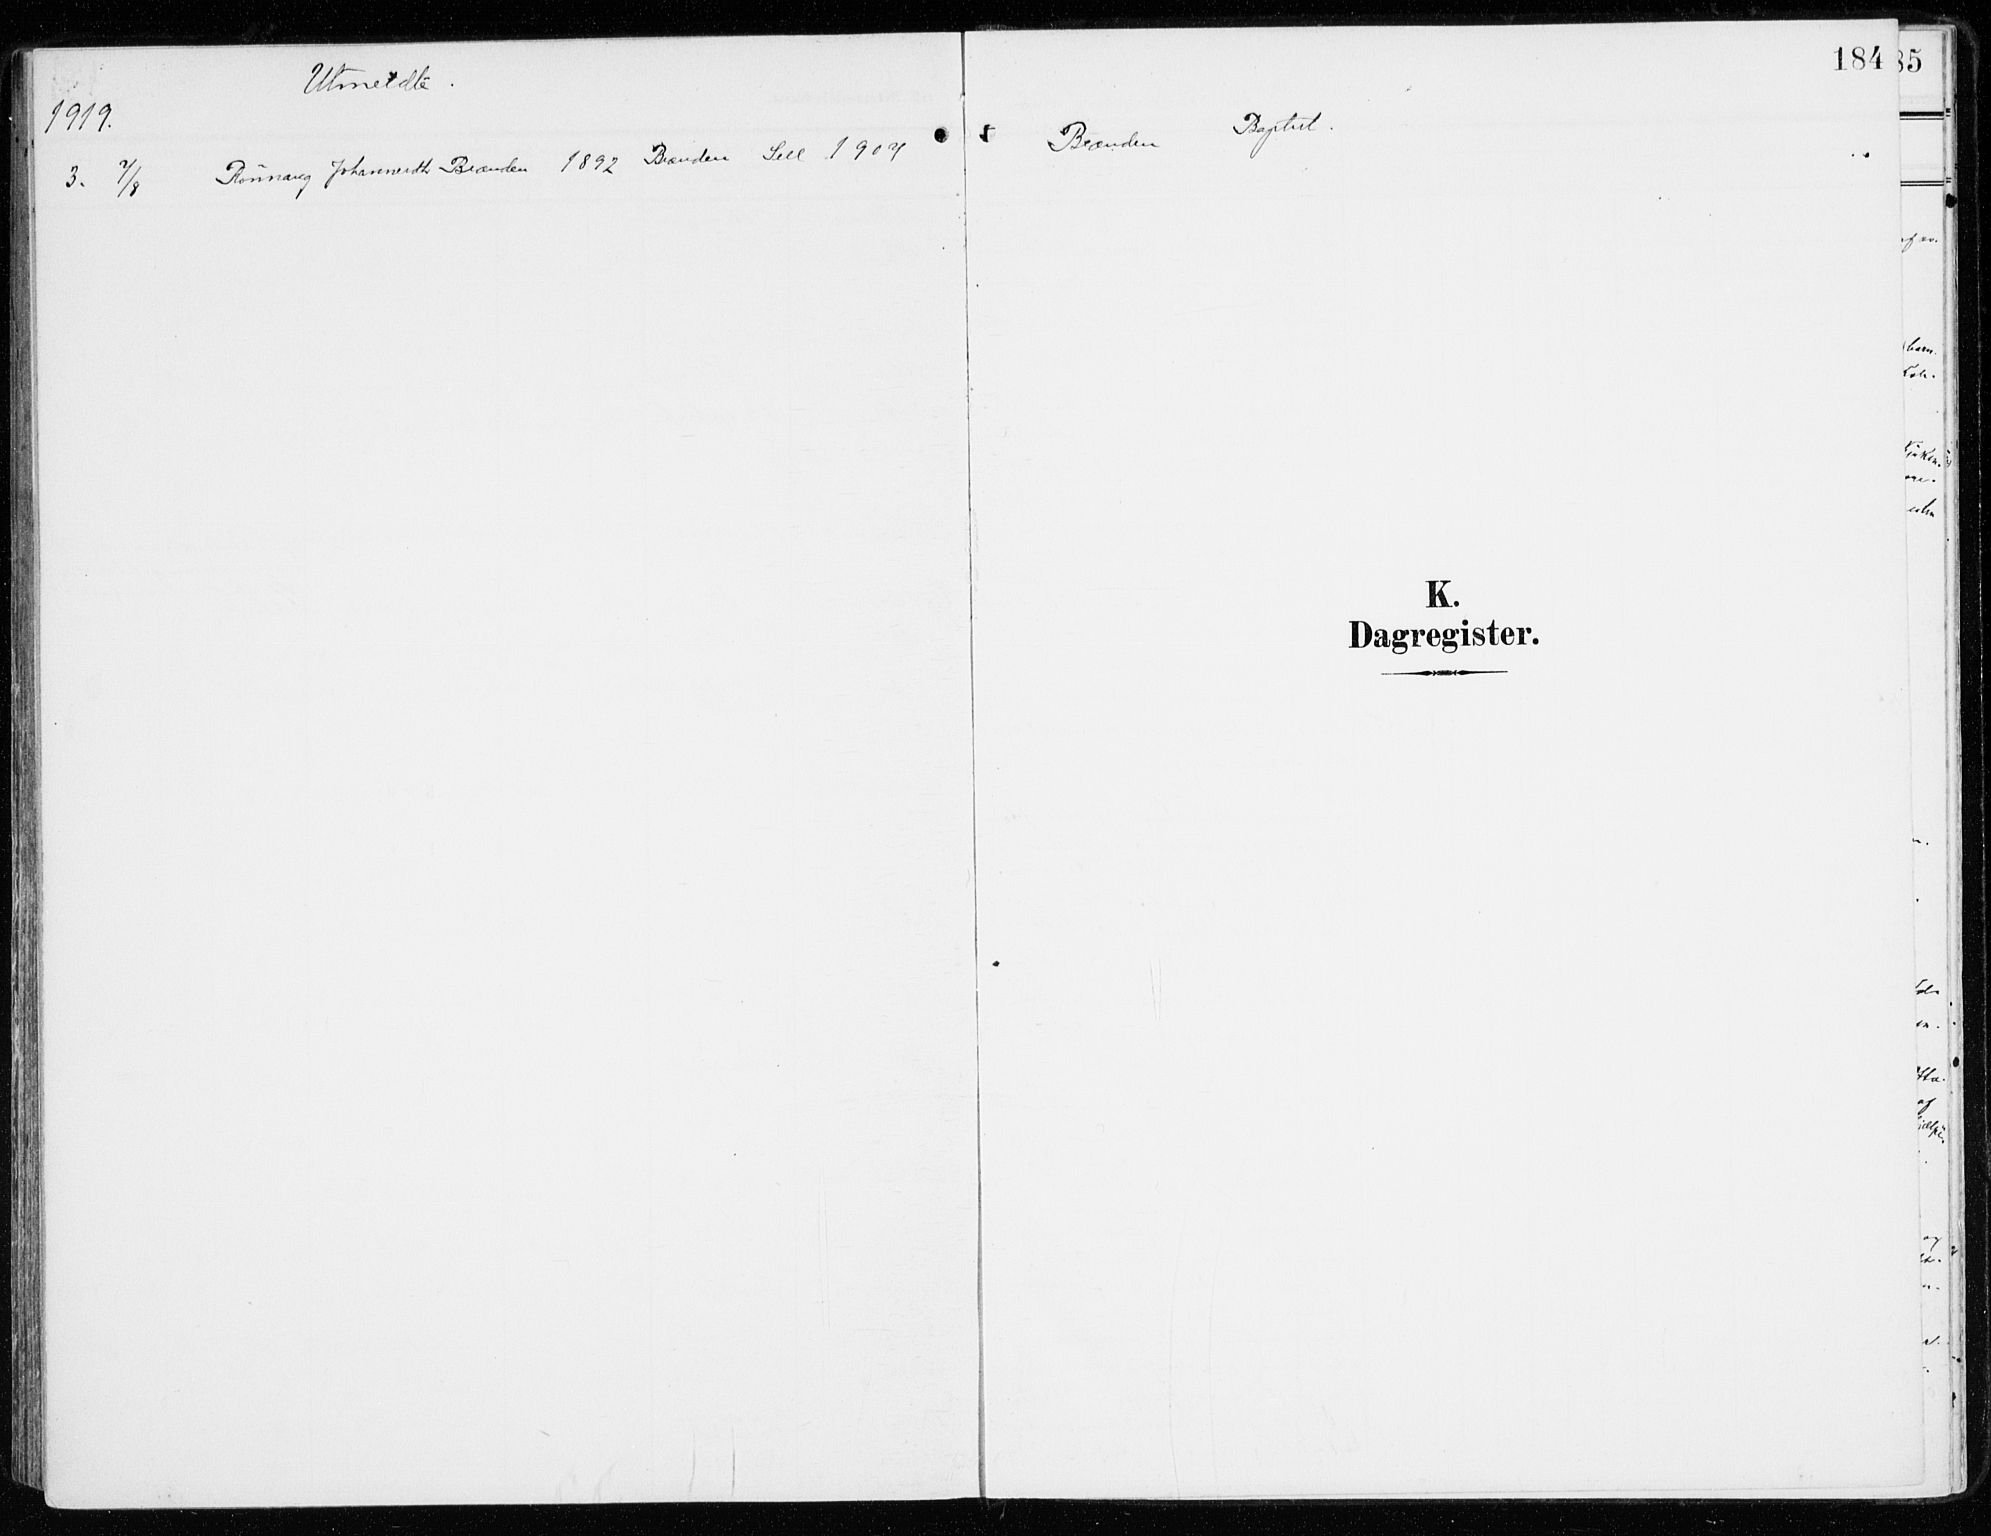 SAH, Sel prestekontor, Ministerialbok nr. 2, 1905-1919, s. 184